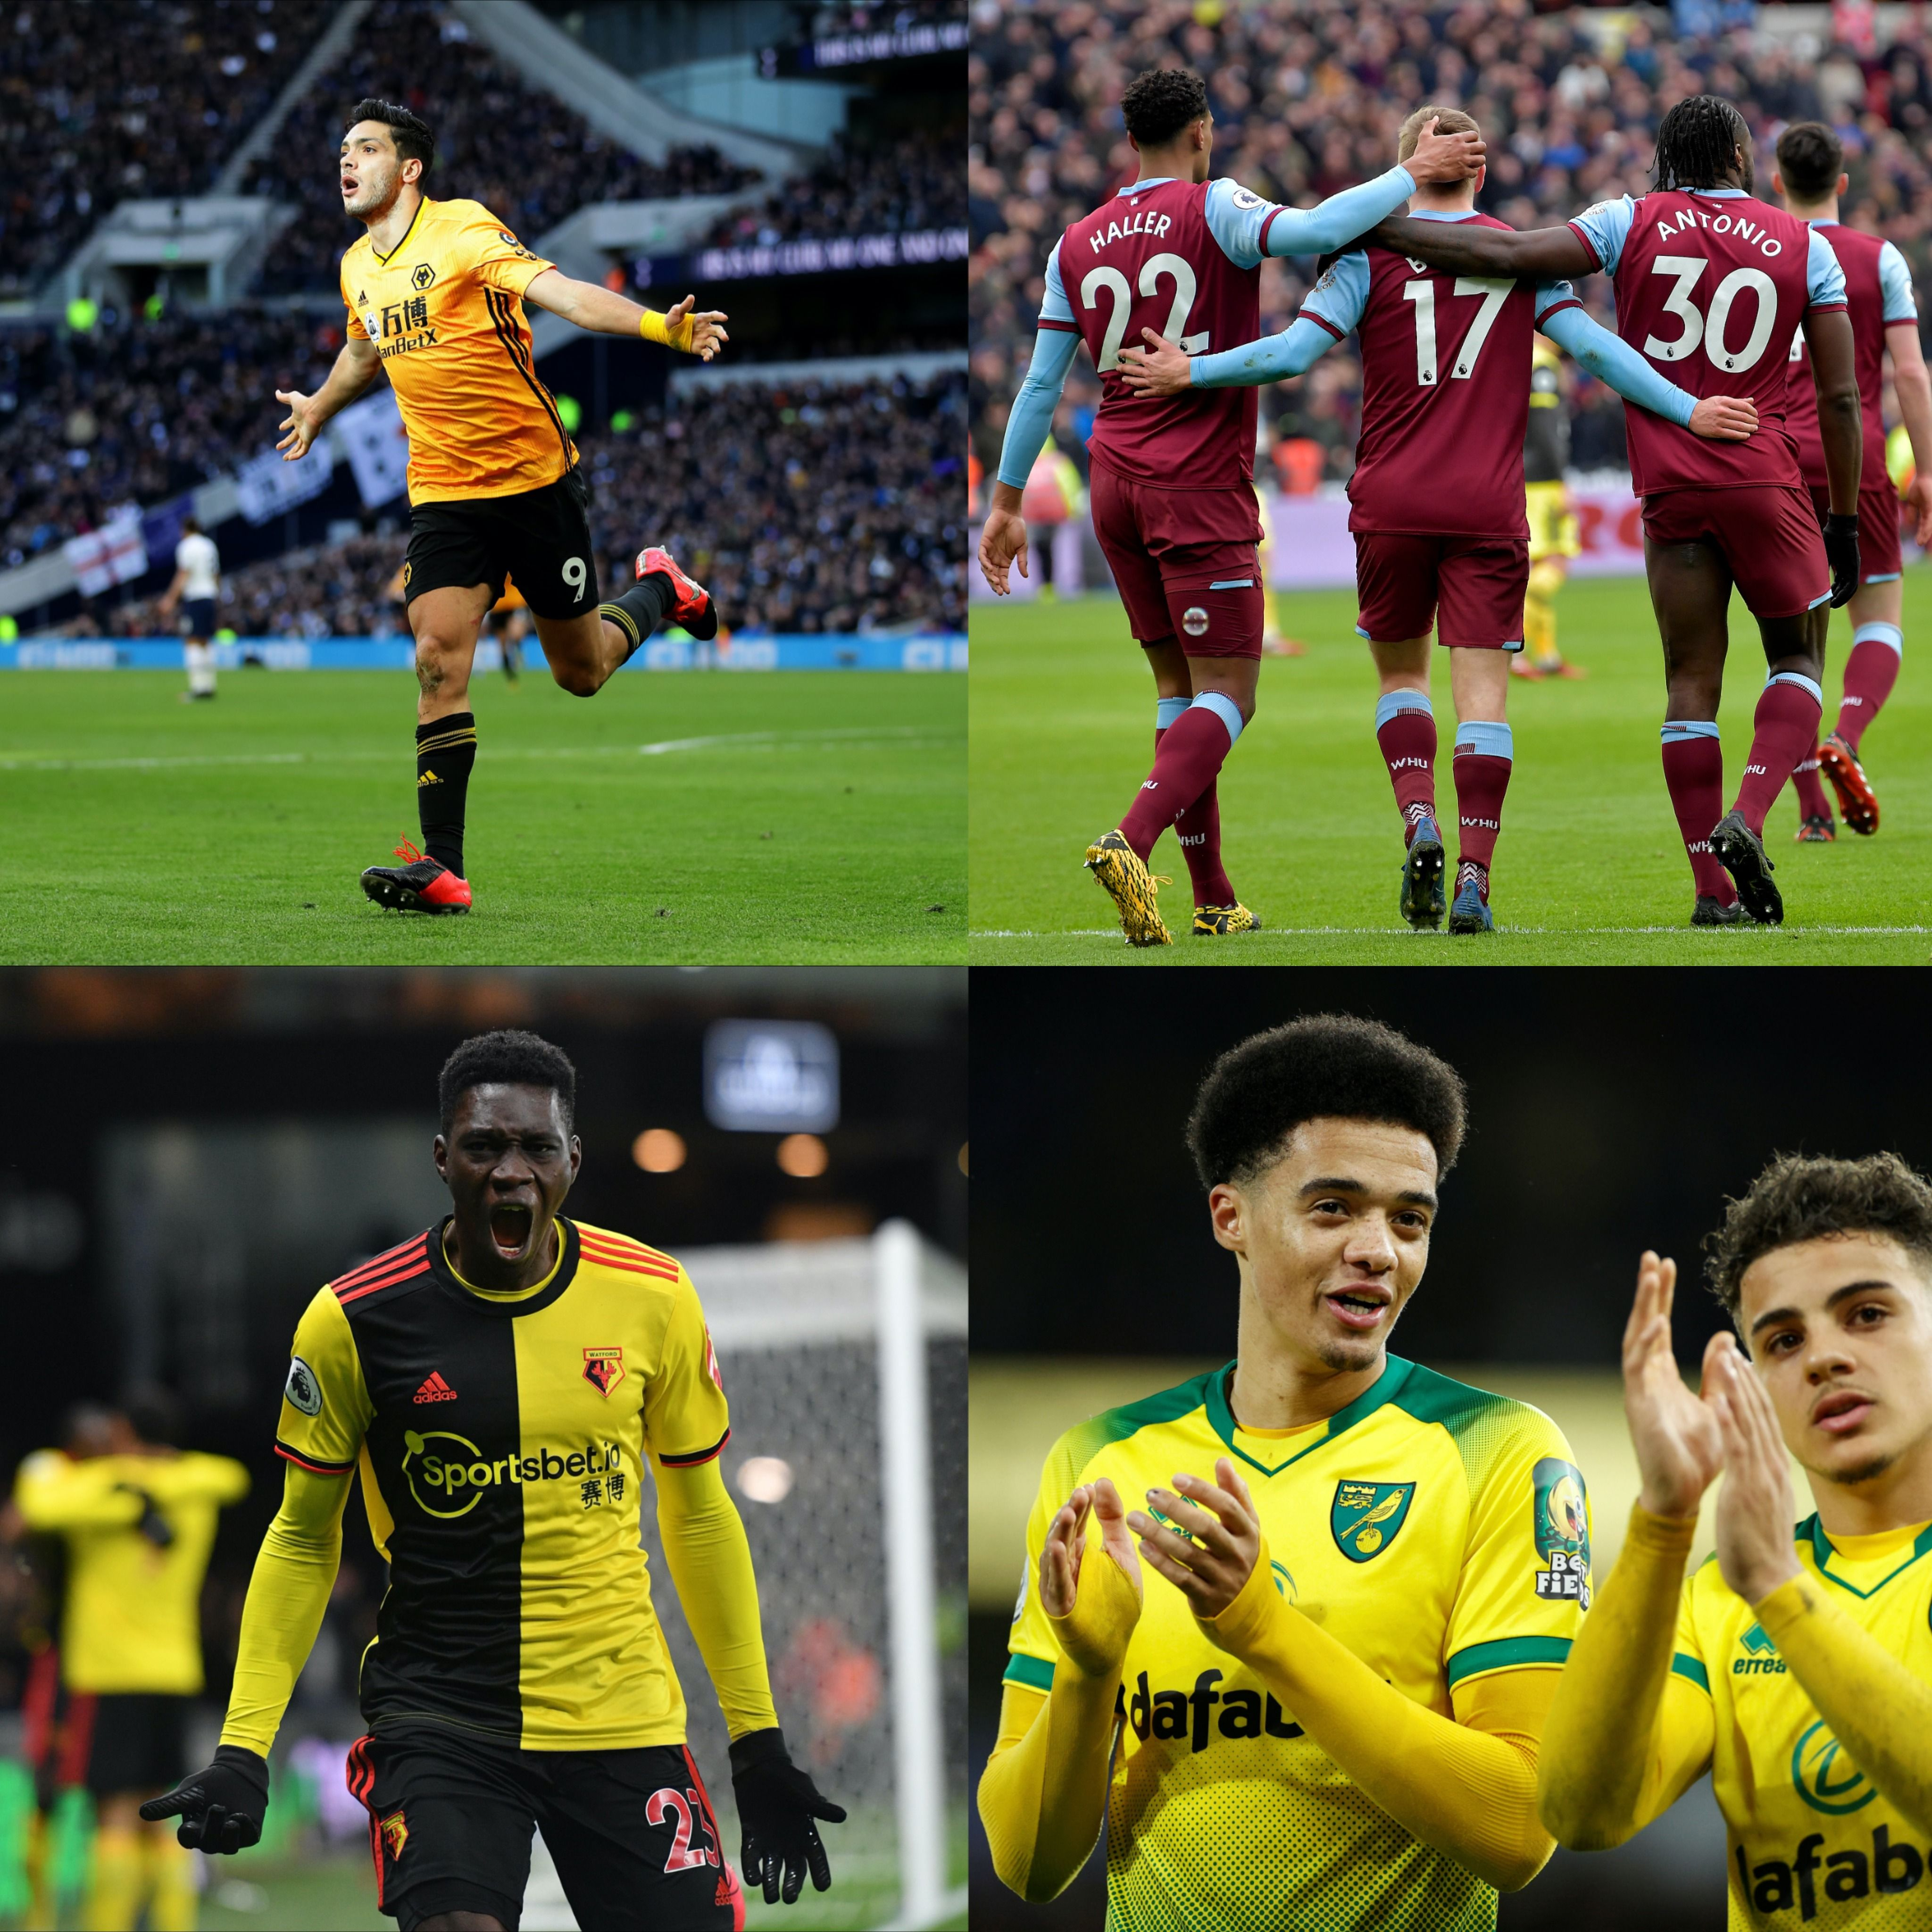 Never Miss A Match Follow 55goal Com In 2020 Soccer Scores Live Soccer Cover Photos